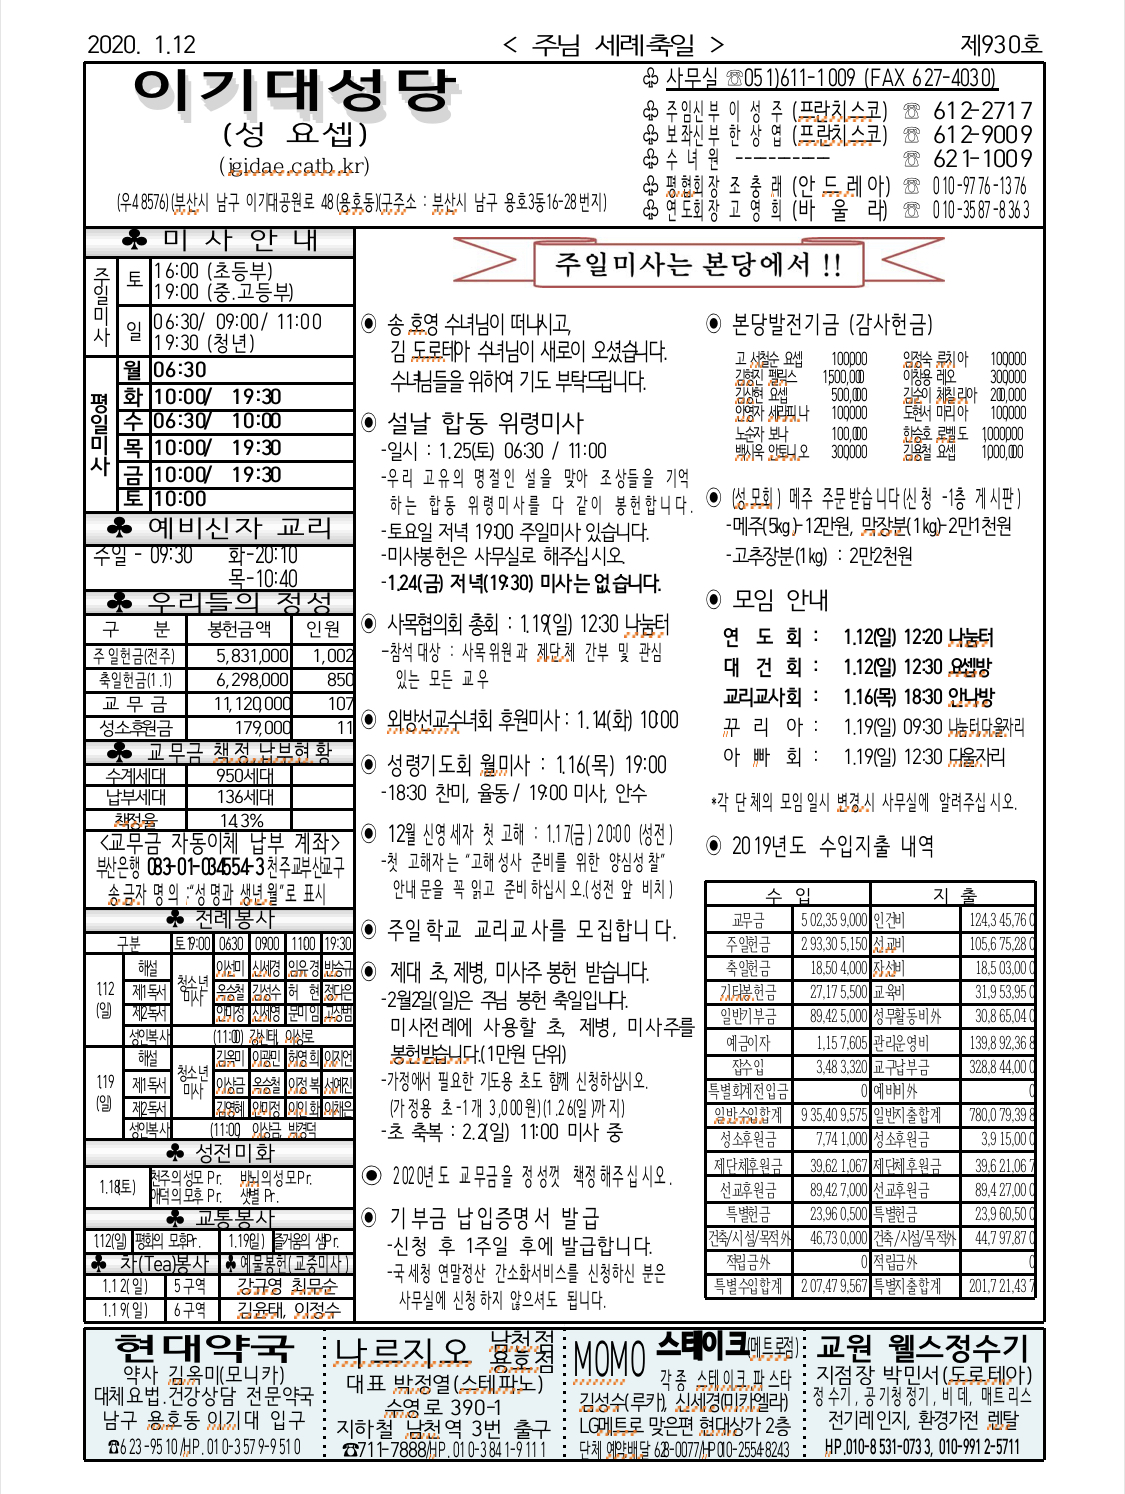 6C934099-5CB2-4C14-BBA2-44327ED7C10C.jpeg